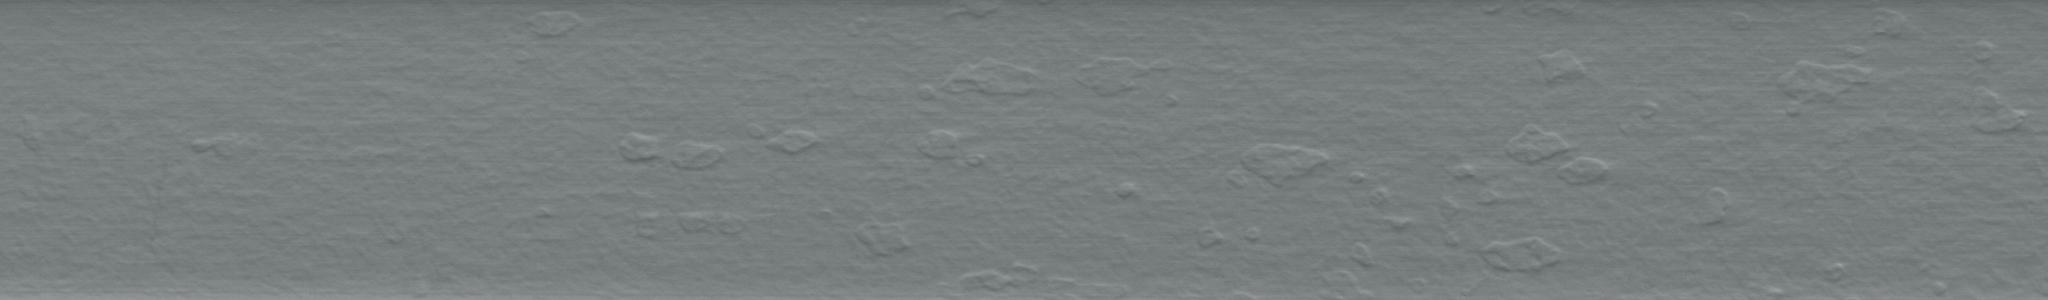 HU 17167 ABS Edge Grey Concrete Pore XH